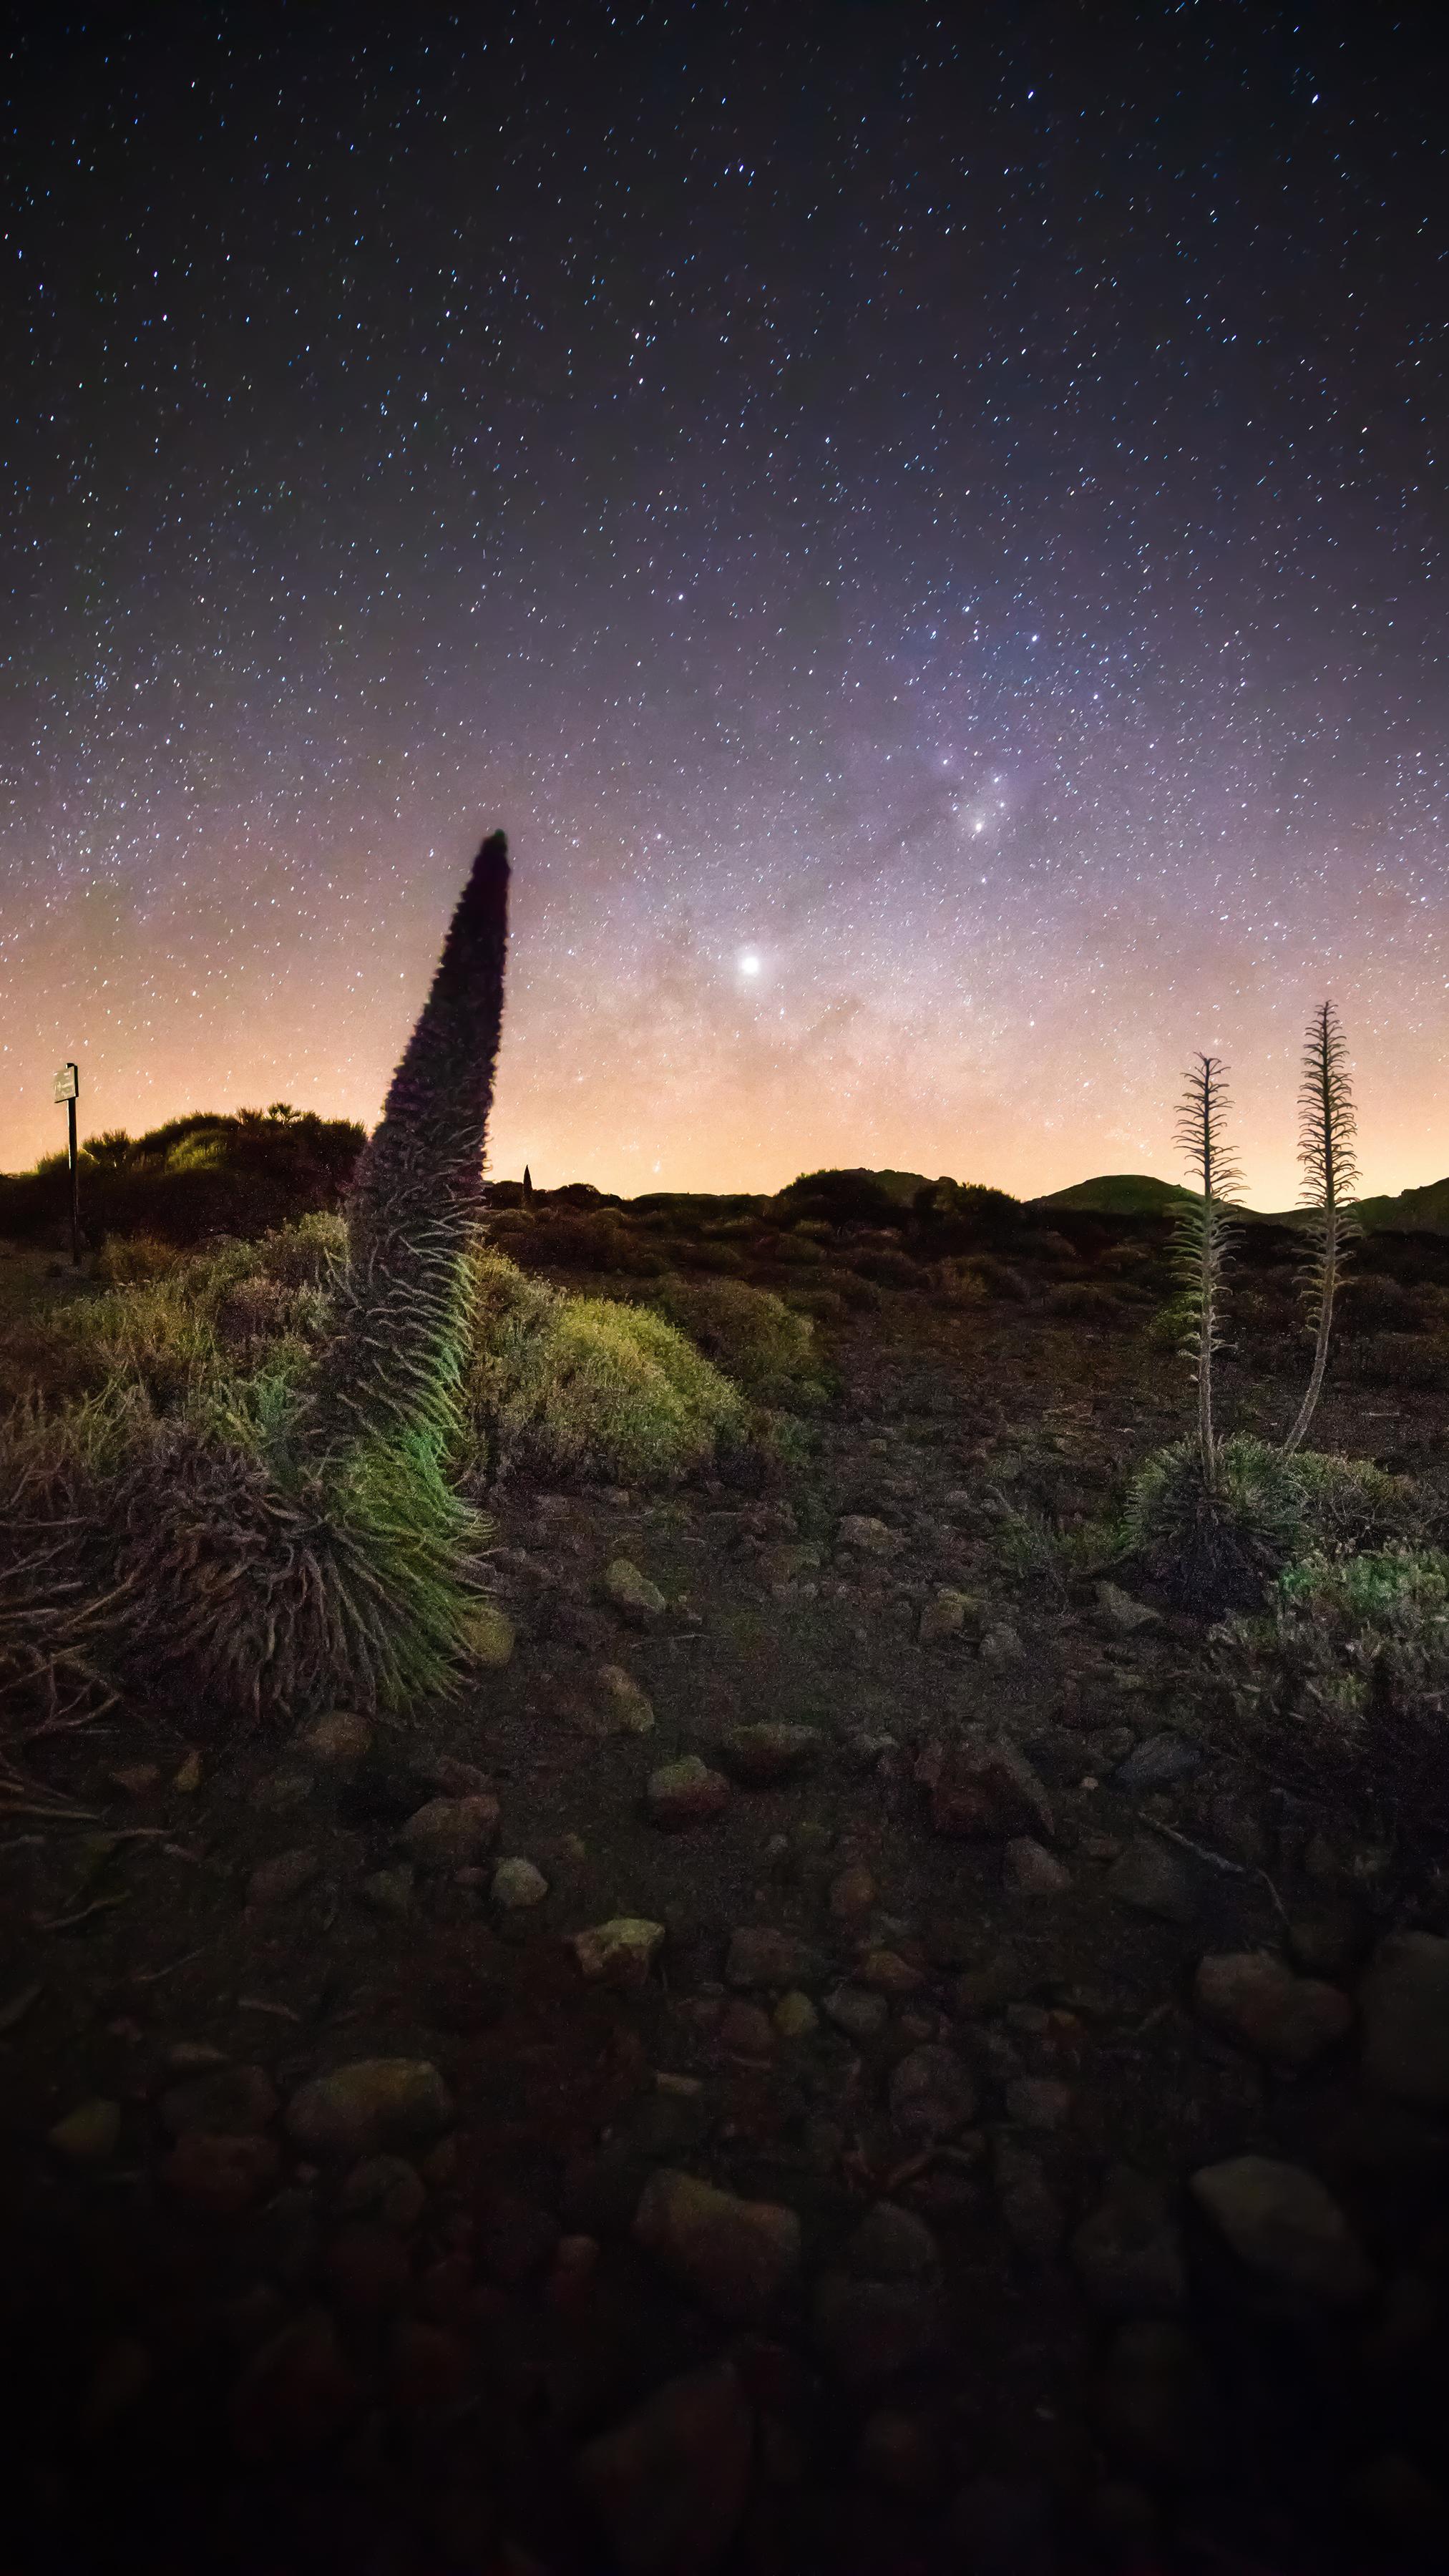 Tajinaste plants and the milky way Tenerife